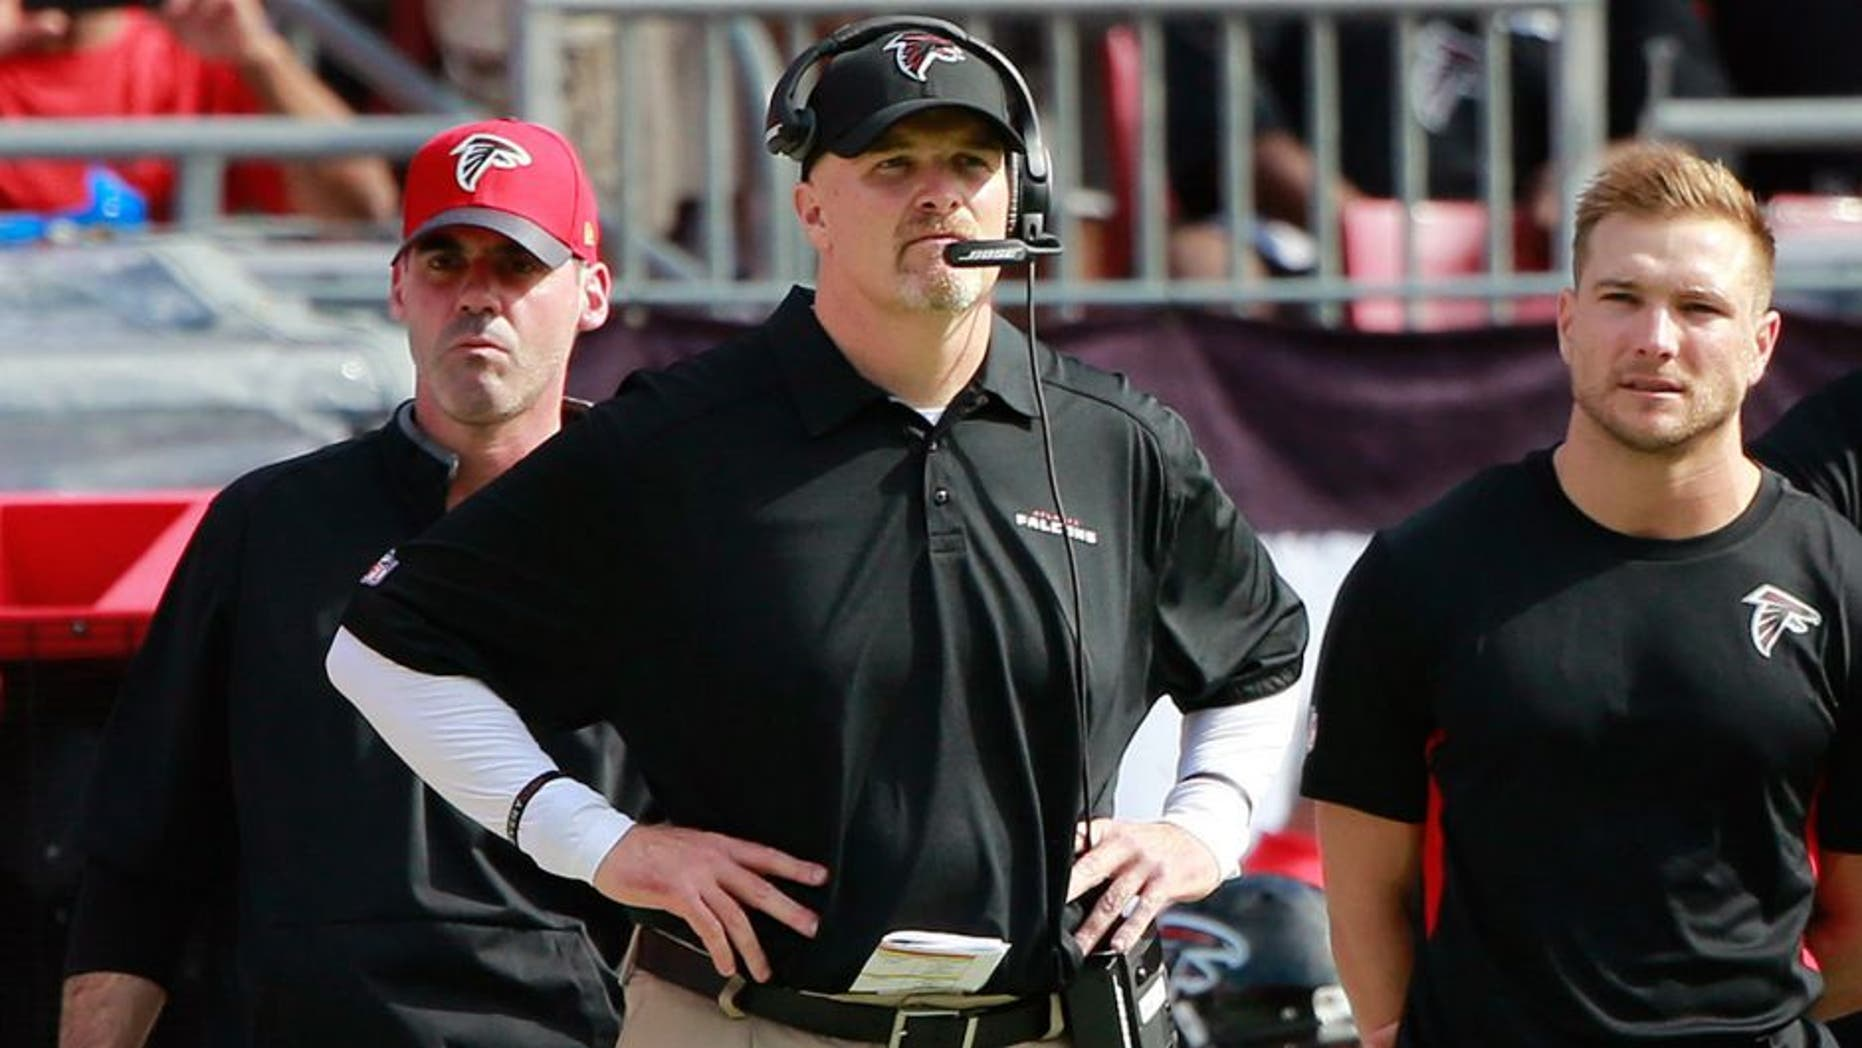 Dec 6, 2015; Tampa, FL, USA; Atlanta Falcons head coach Dan Quinn during the first quarter at Raymond James Stadium. Mandatory Credit: Kim Klement-USA TODAY Sports